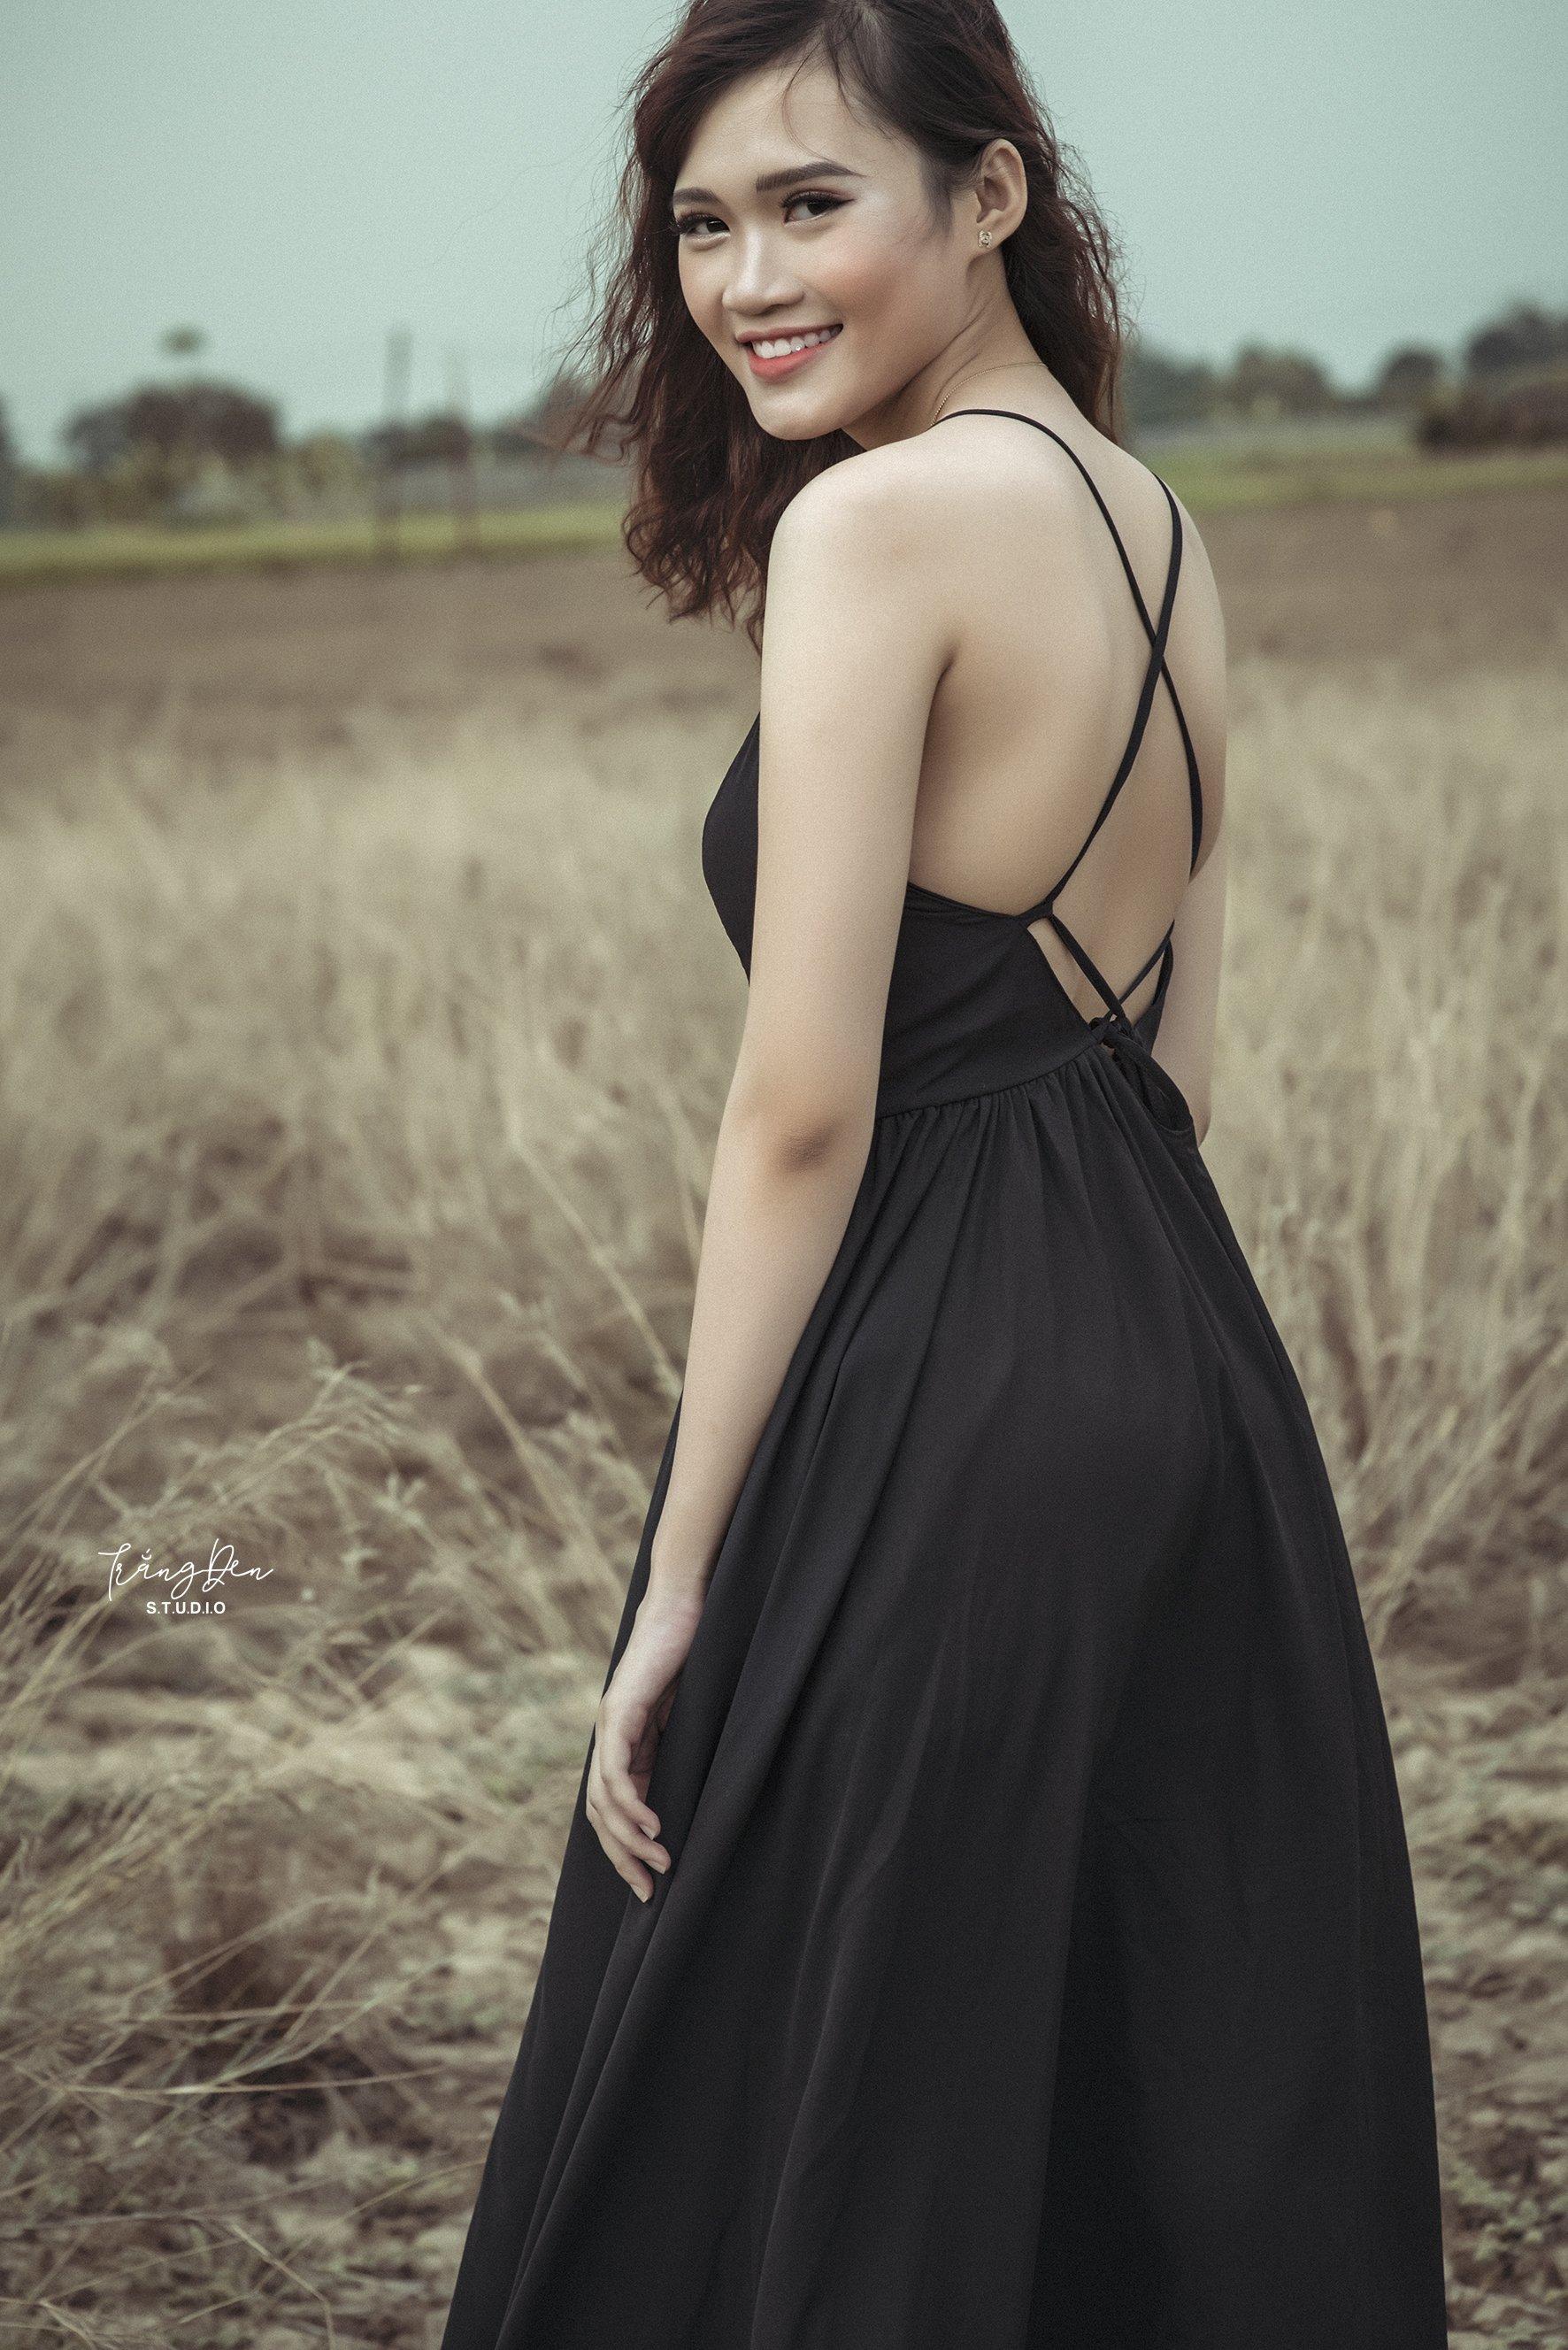 #nude #portrait #art #beauty #roman #women #light #glass #travel, Thiên Vũ Vũ